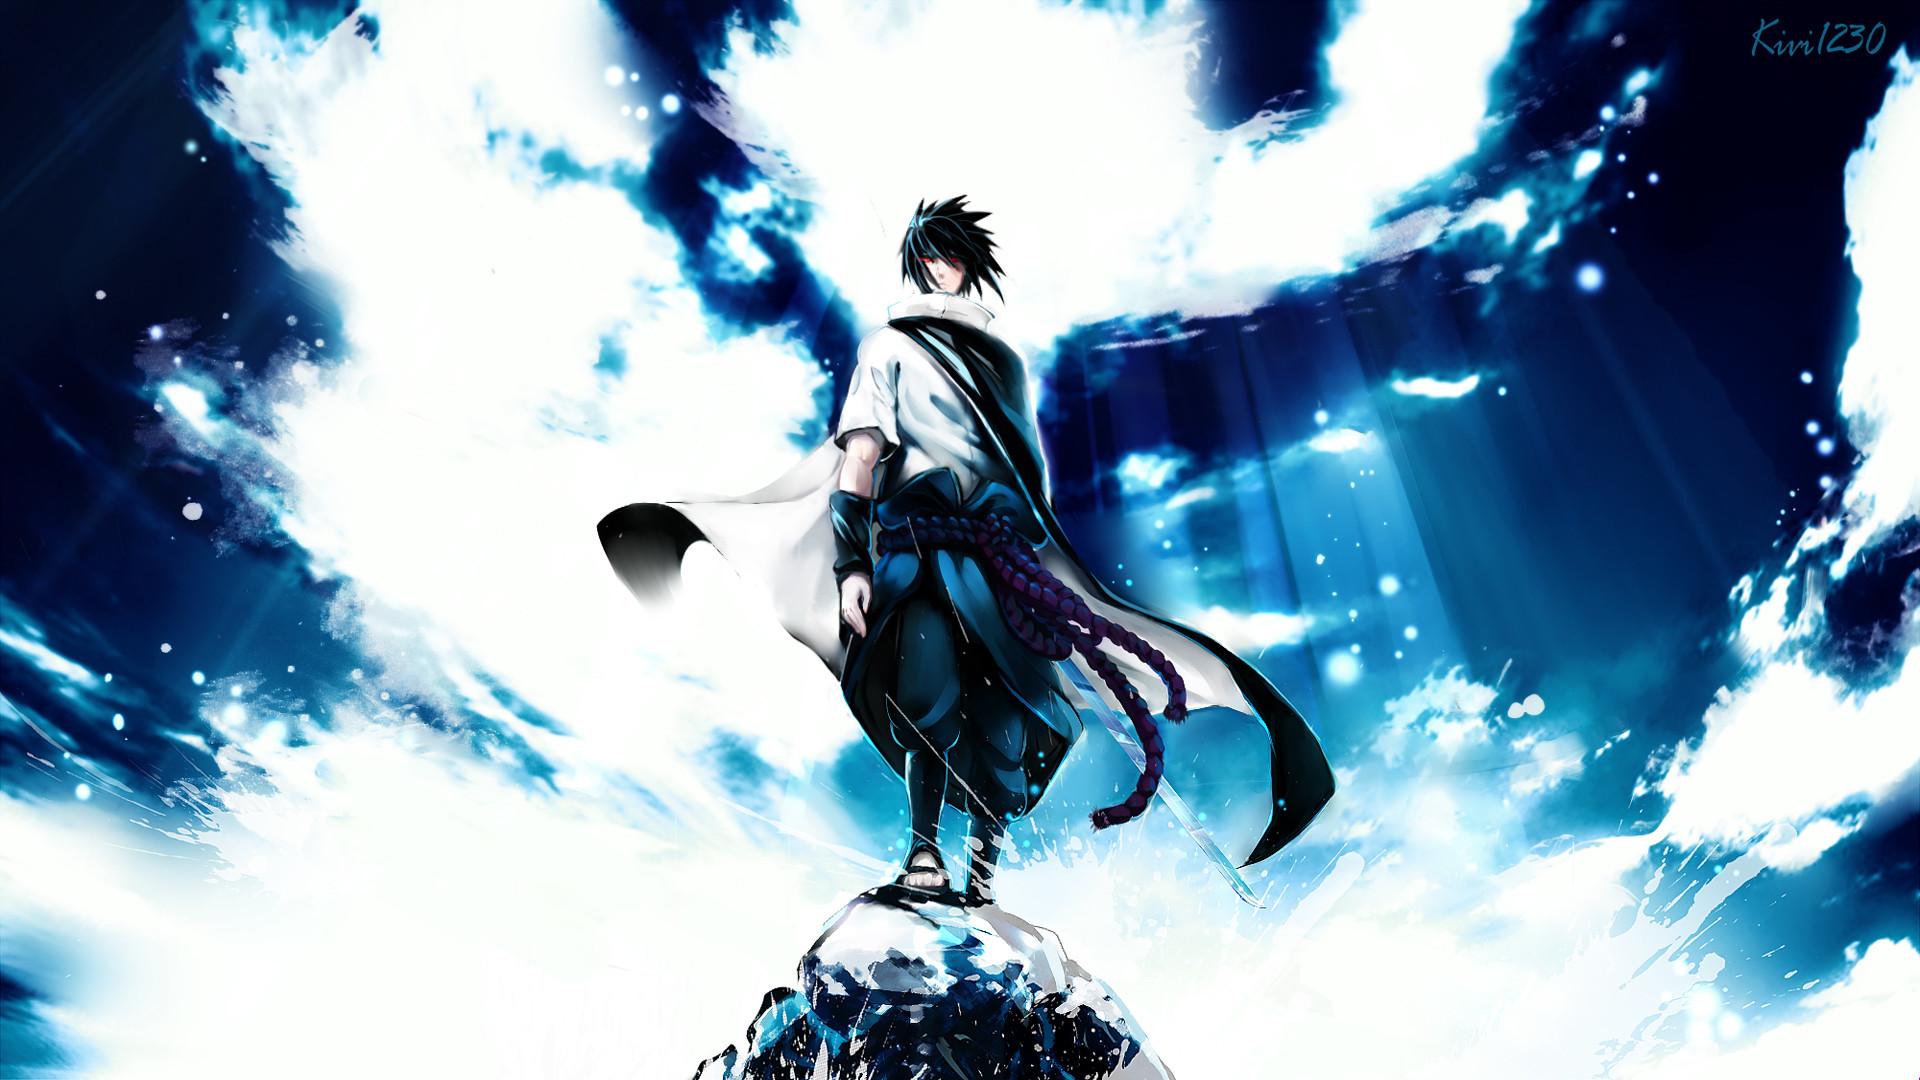 Naruto Uchiha Sasuke Manga hd wallpaper by BillGate